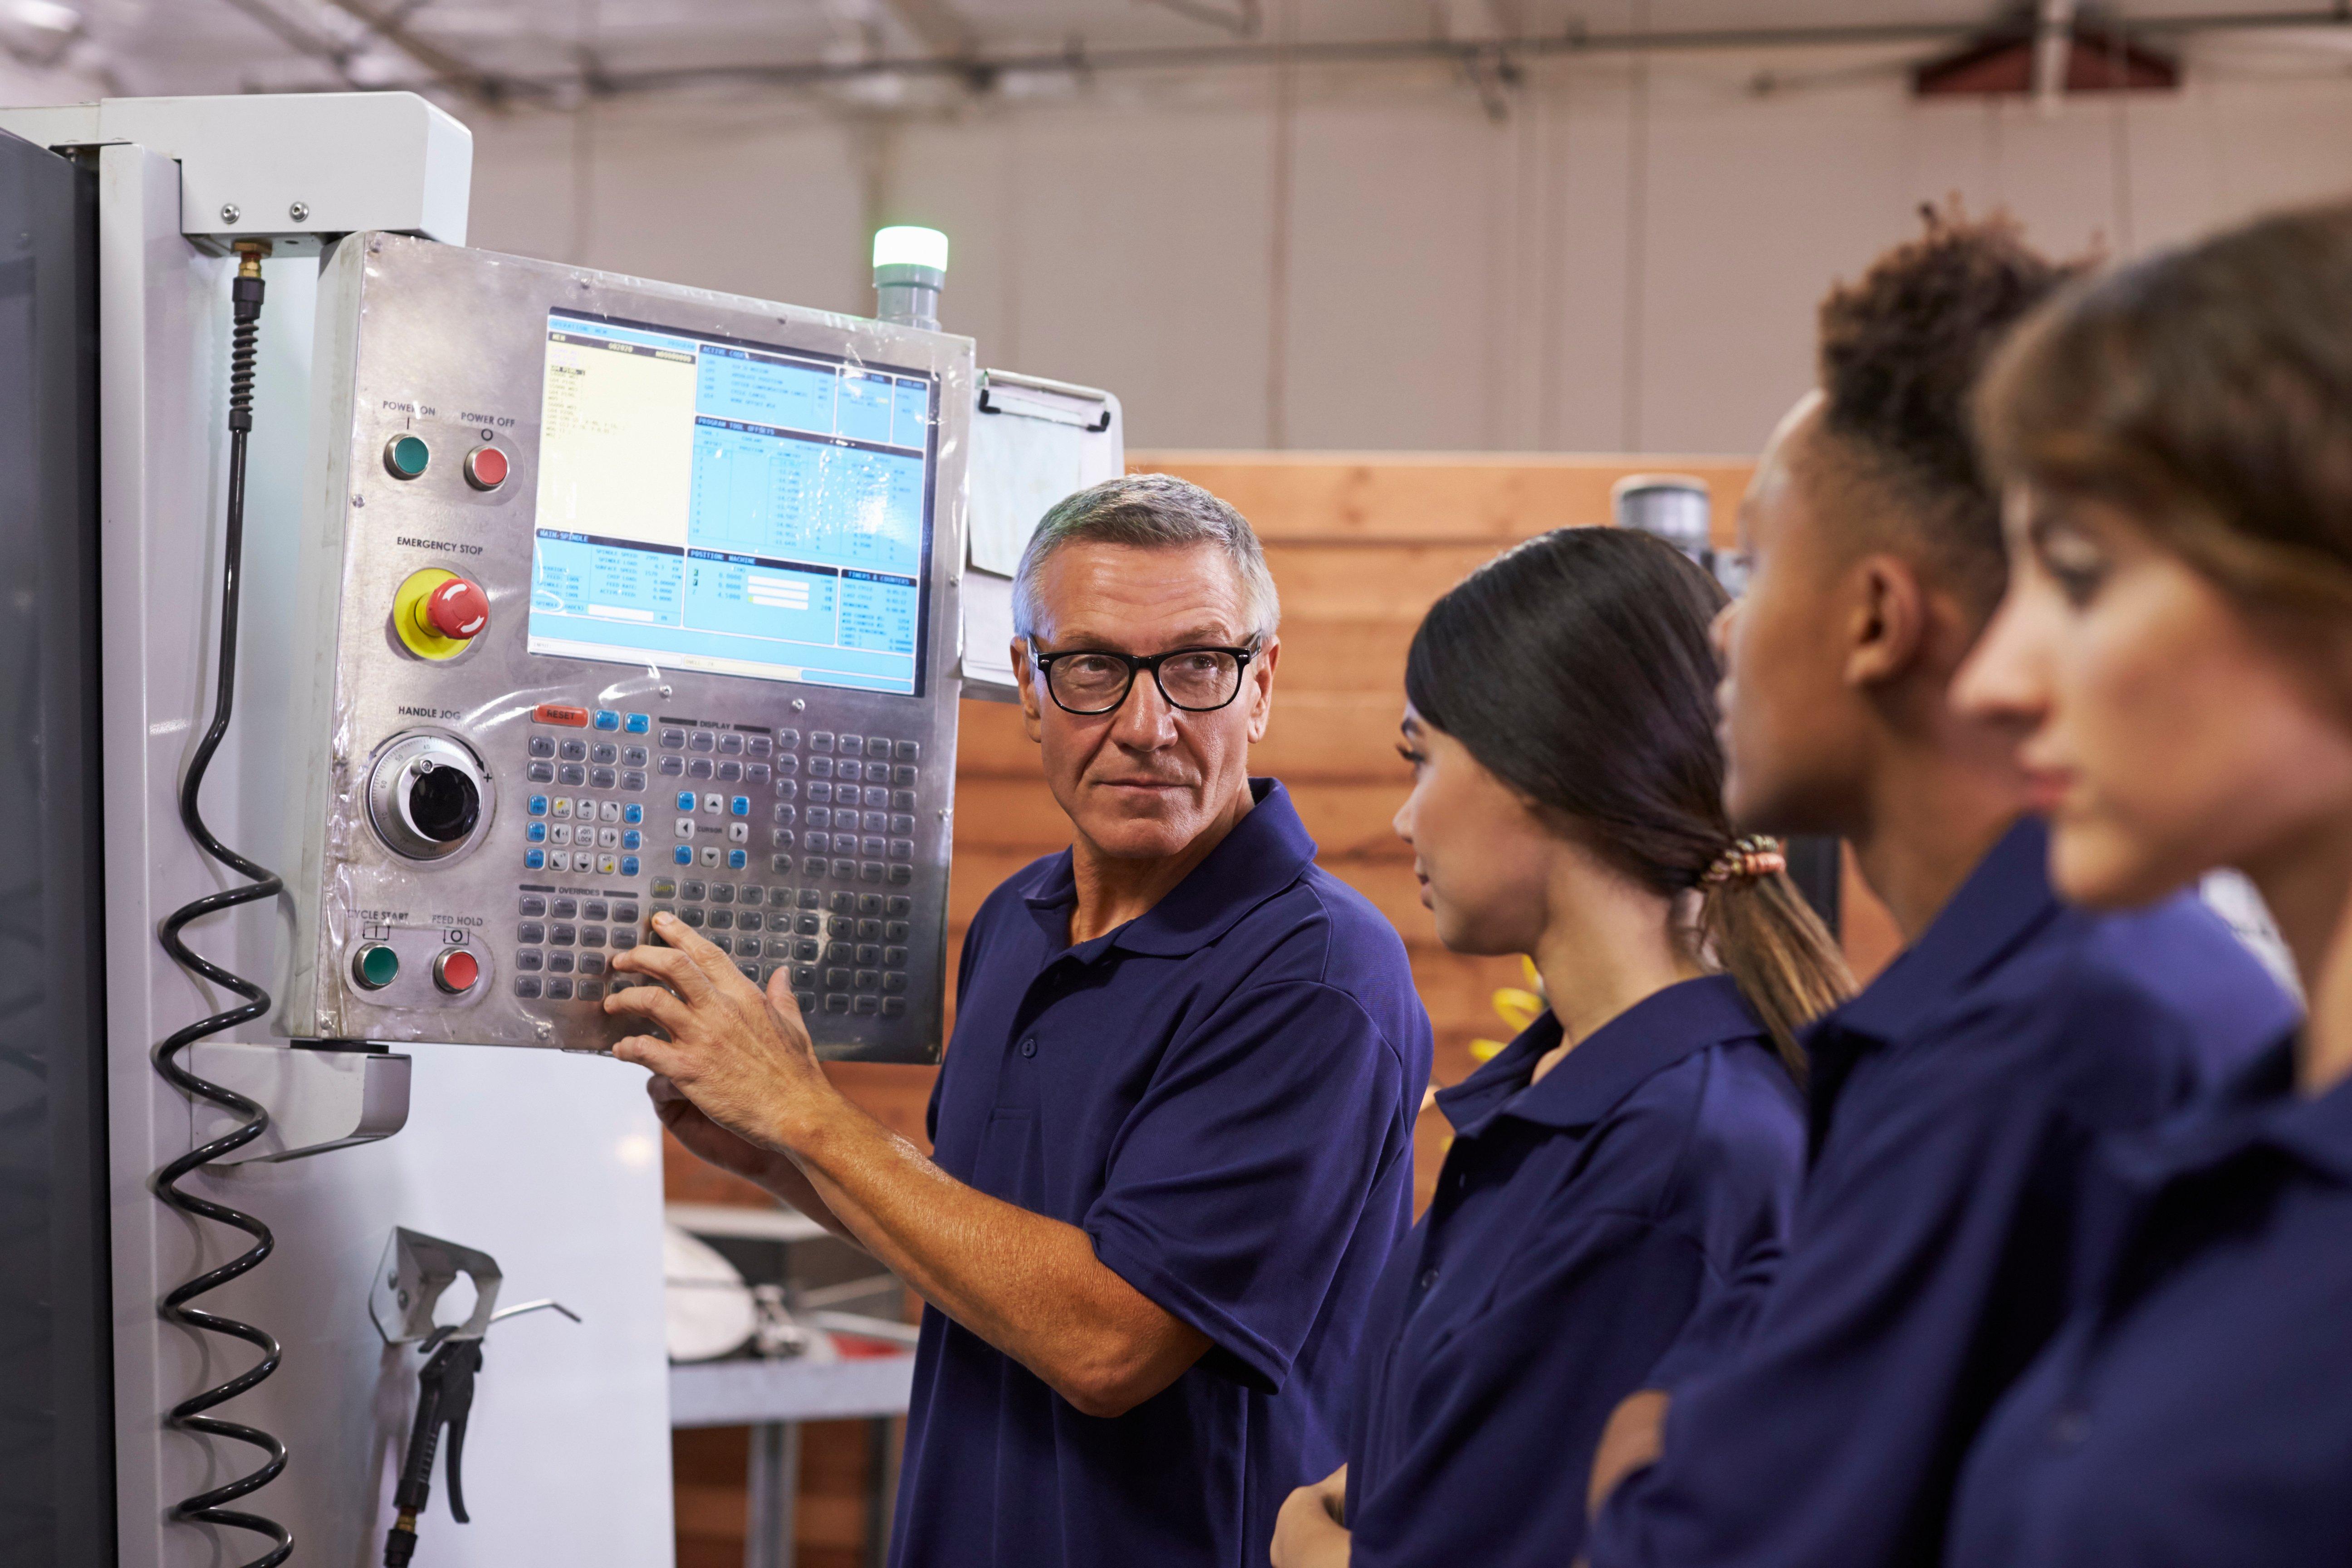 engineer-training-apprentices-on-cnc-machine-PTK2L3S